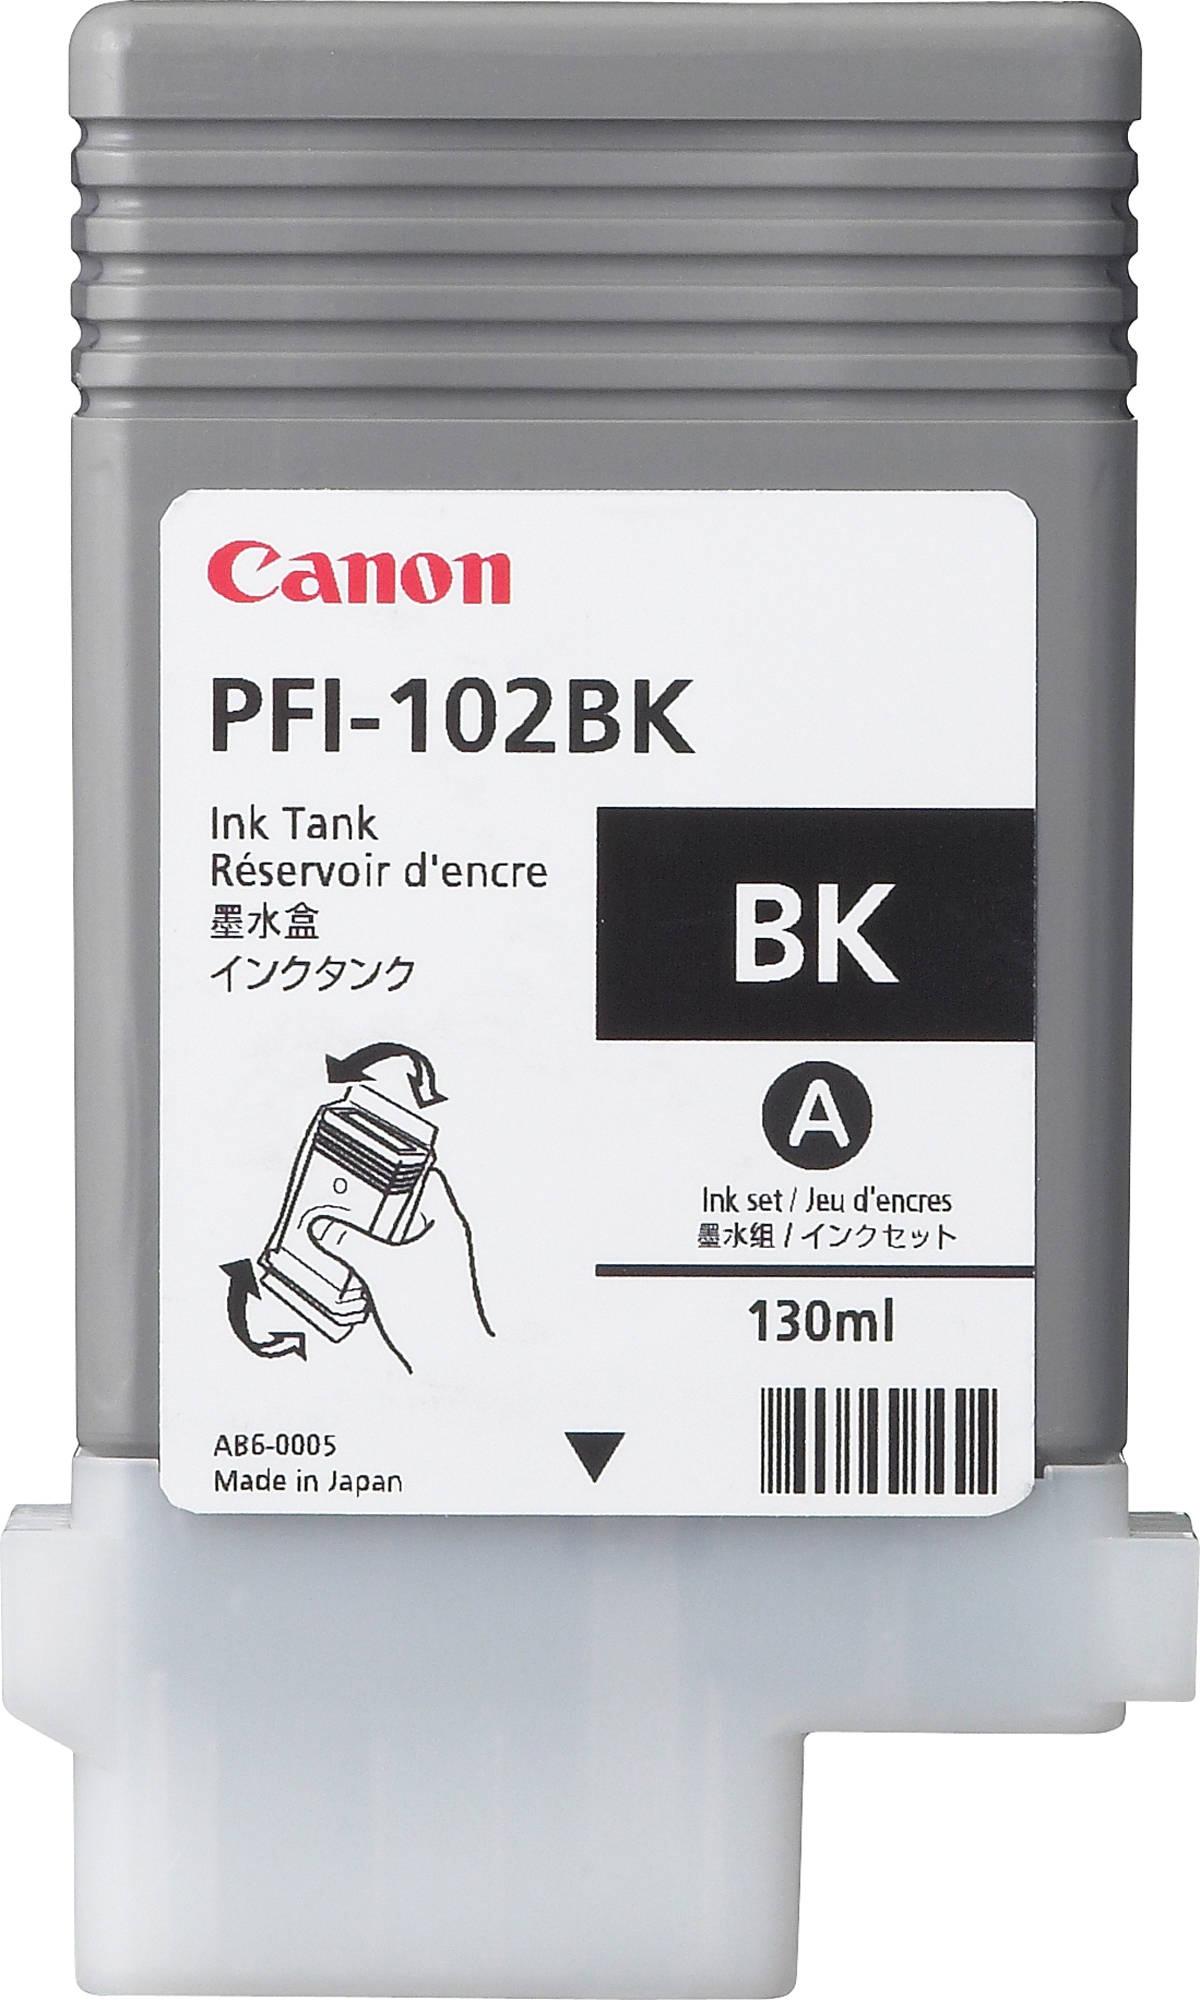 Canon PFI-102BK (0895B001) - картридж для принтеров Canon iPF500/600/610/700/710 (Black)